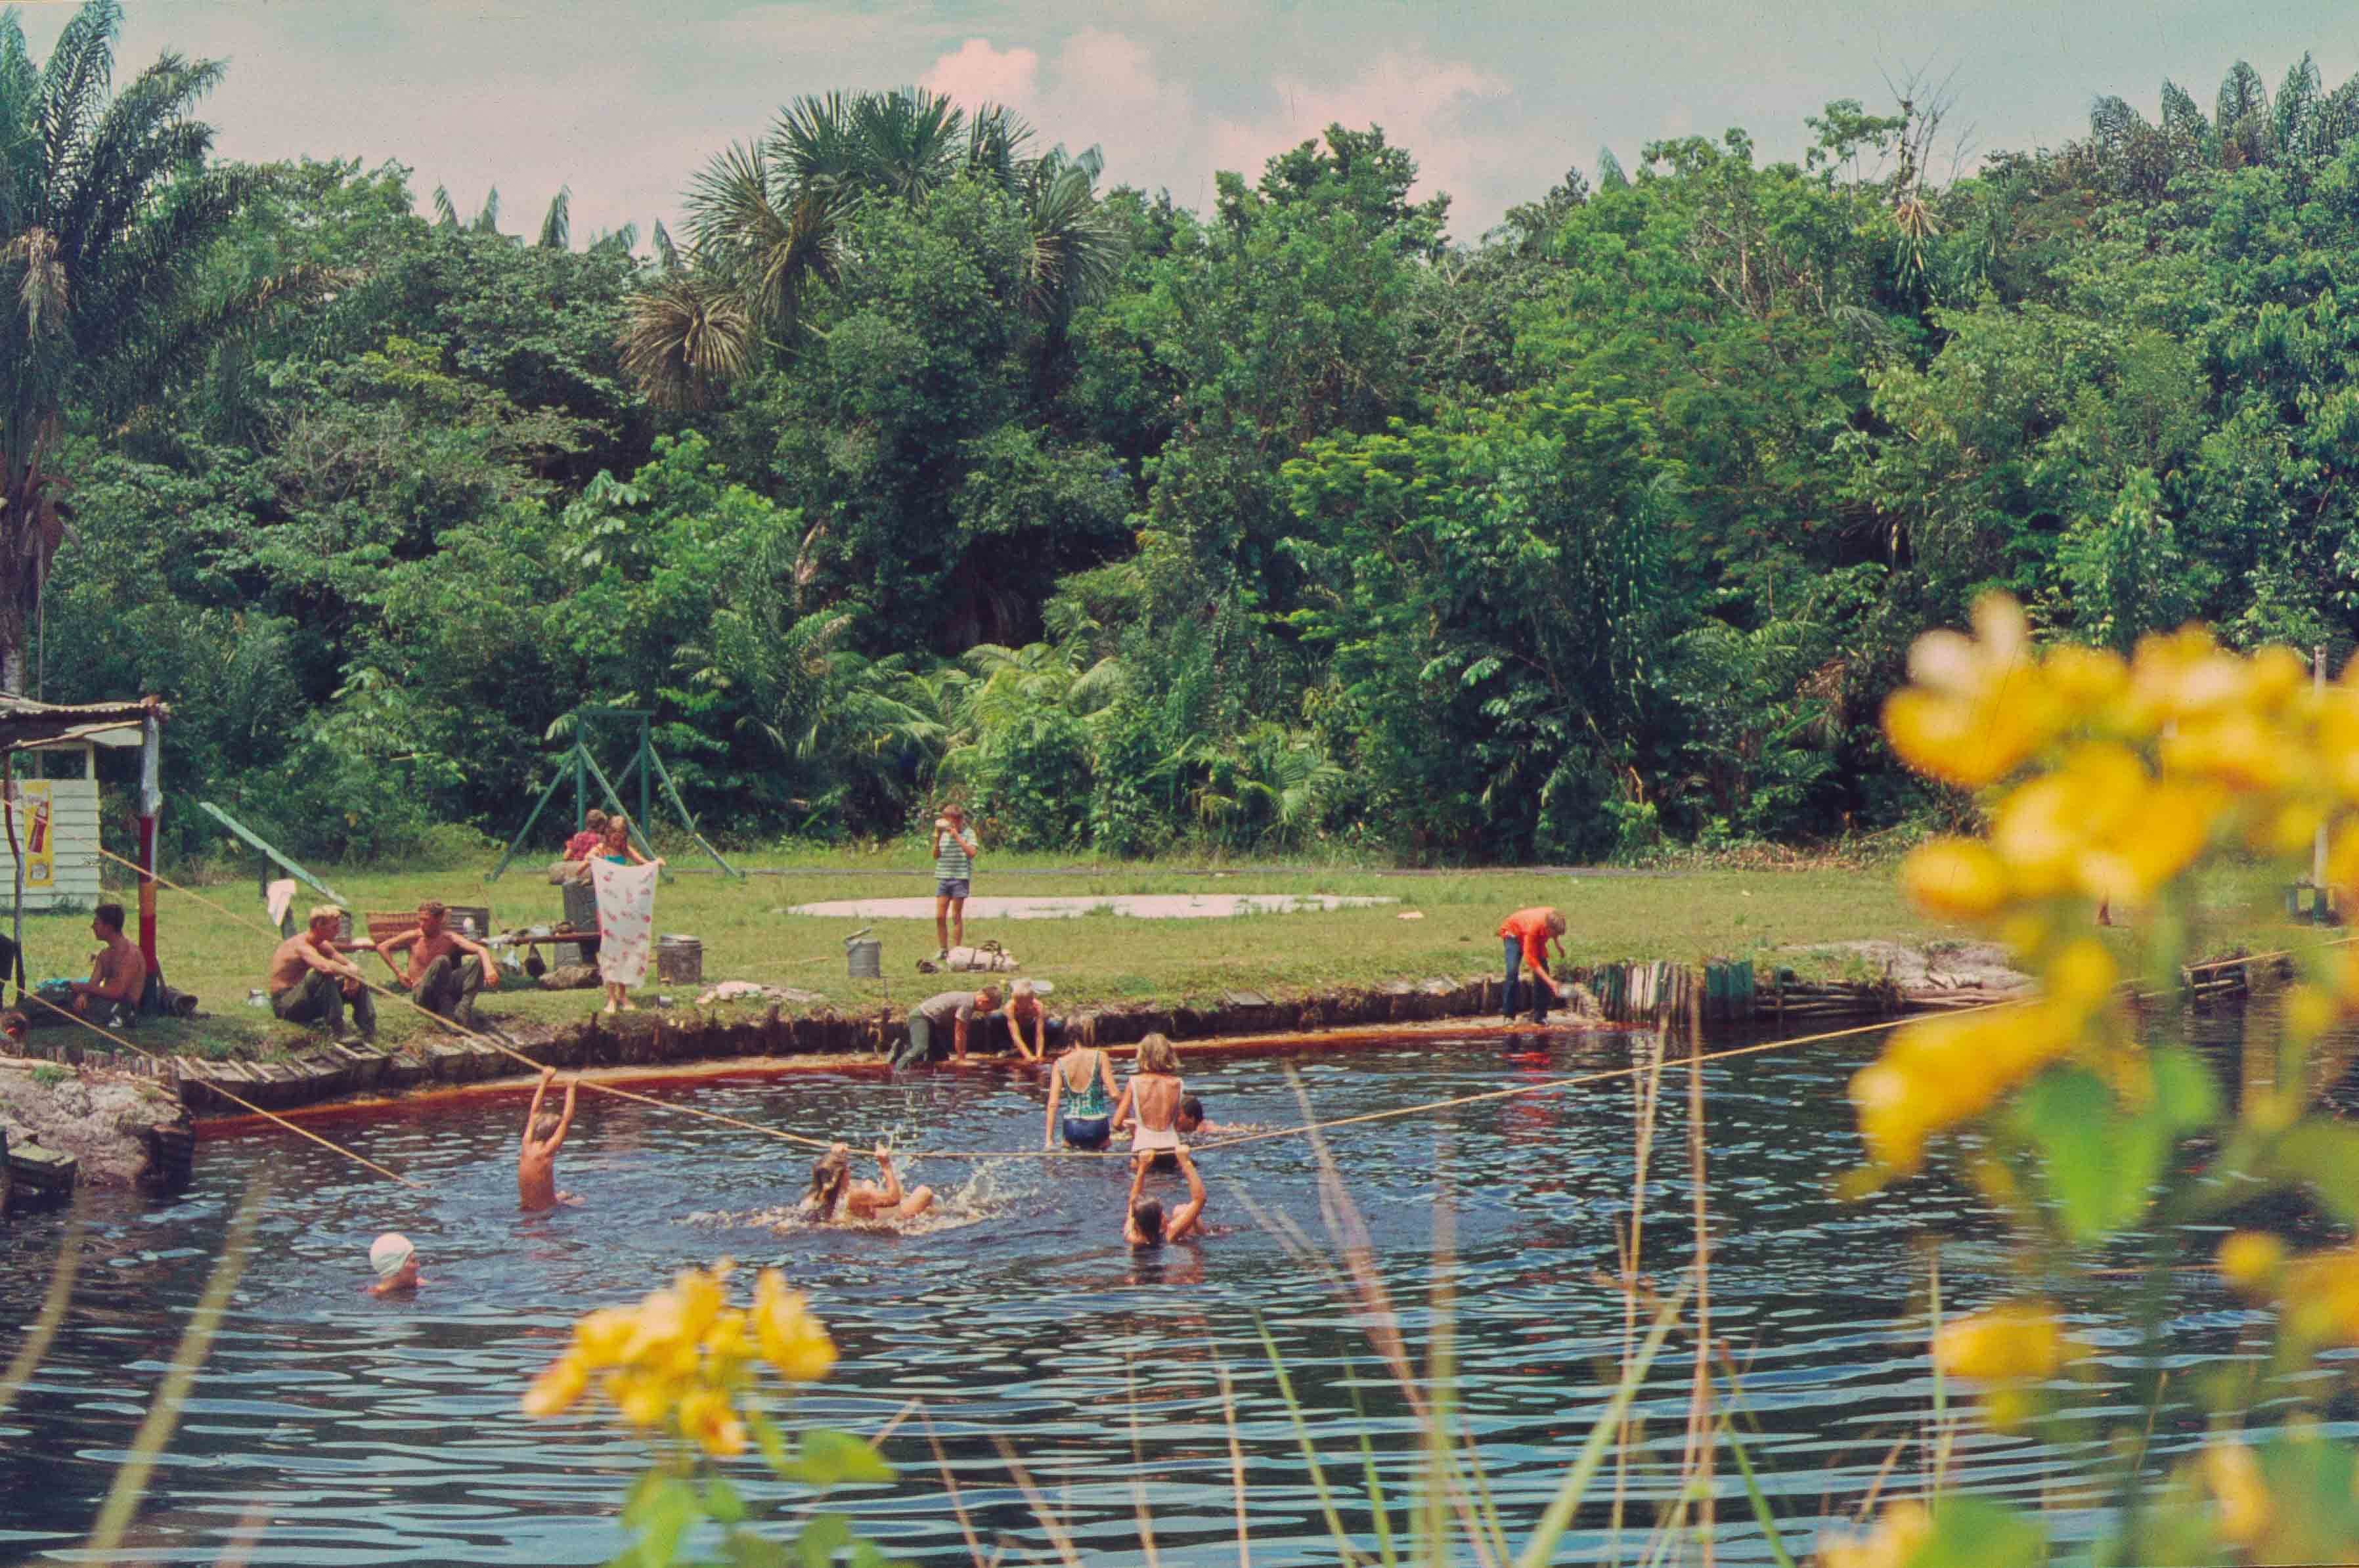 75. Suriname